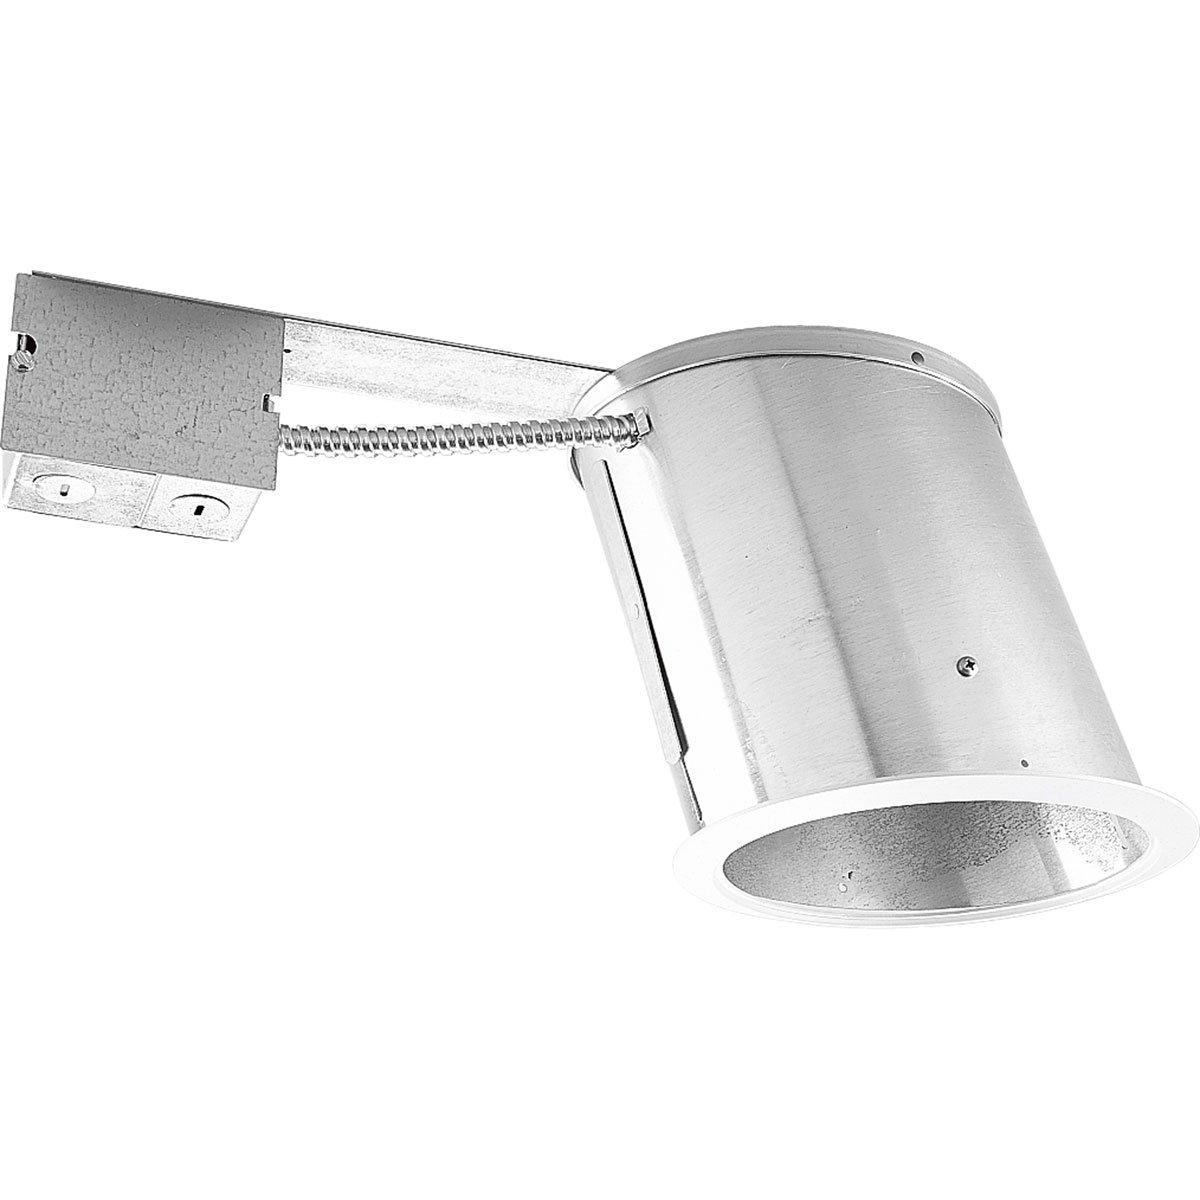 Progress Lighting P745-IC 6-Inch Slope Remodel Housing For ...